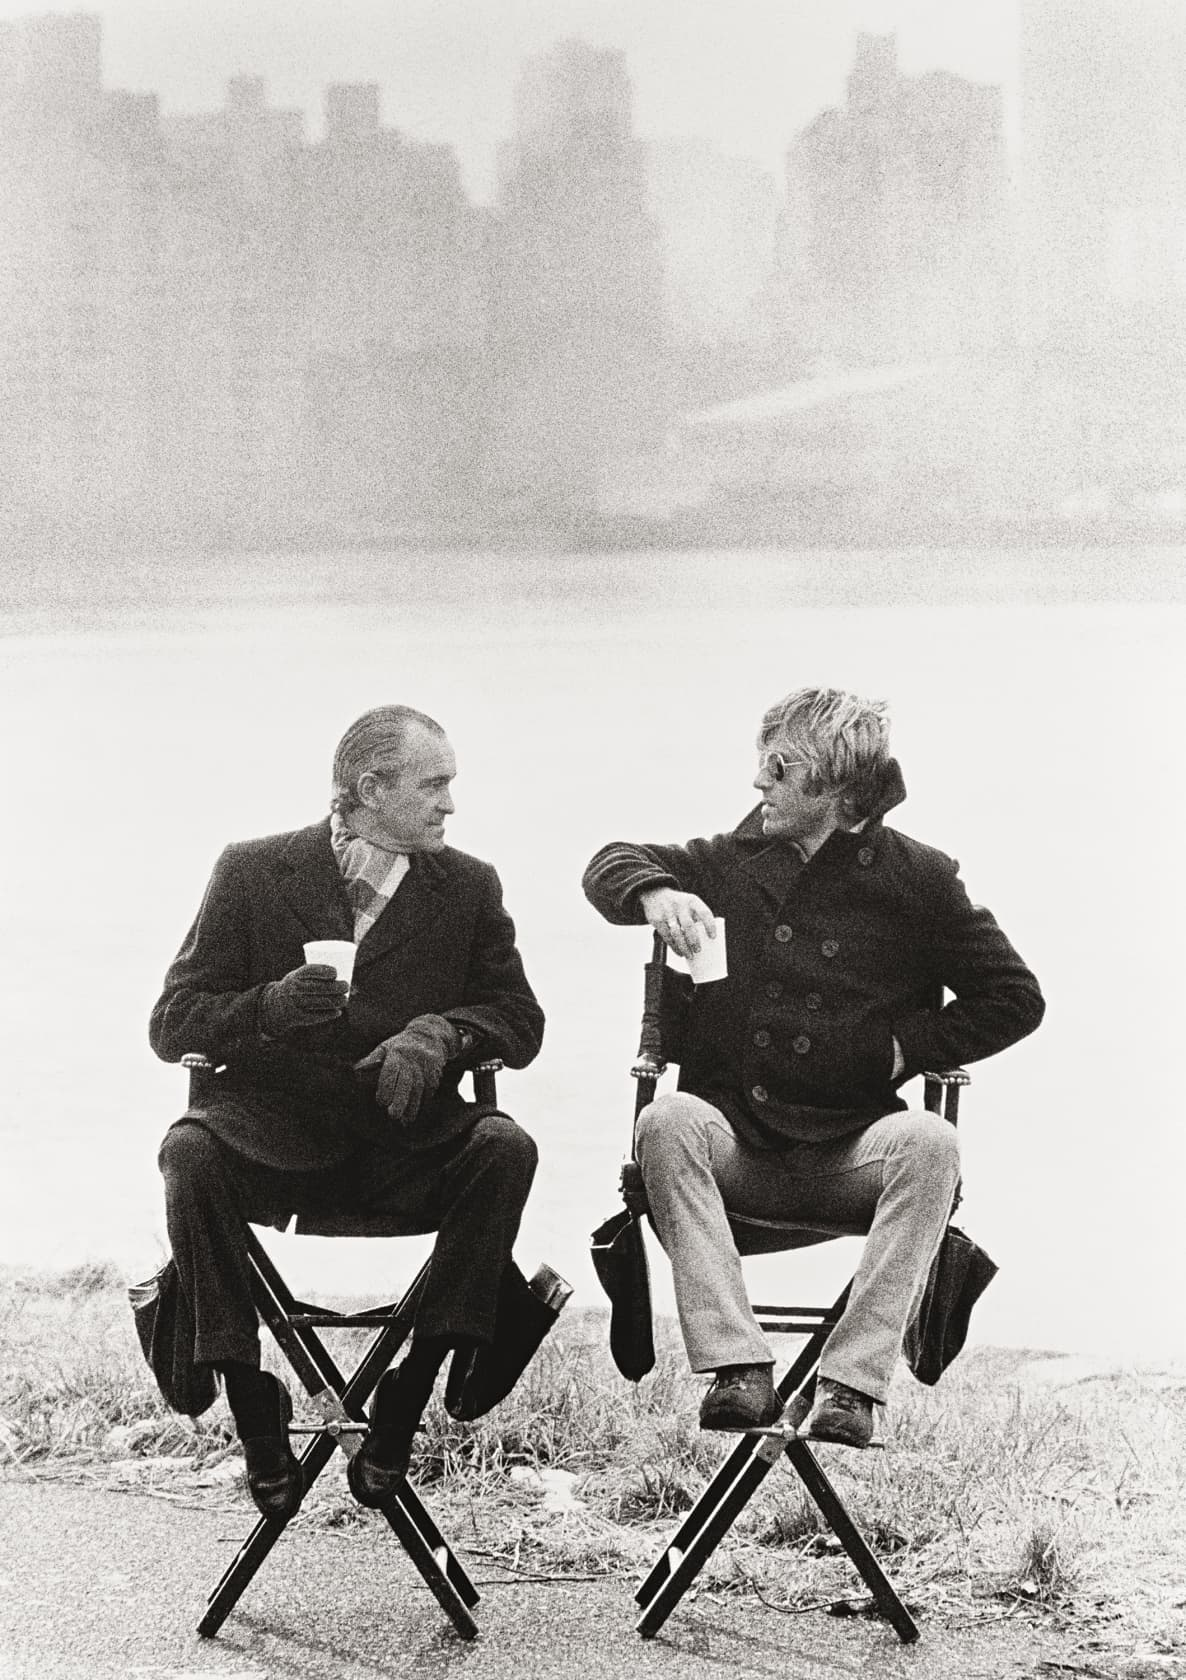 Terry O'Neill Robert Redford and Richard Helms, New York Lifetime Gelatin Silver Print